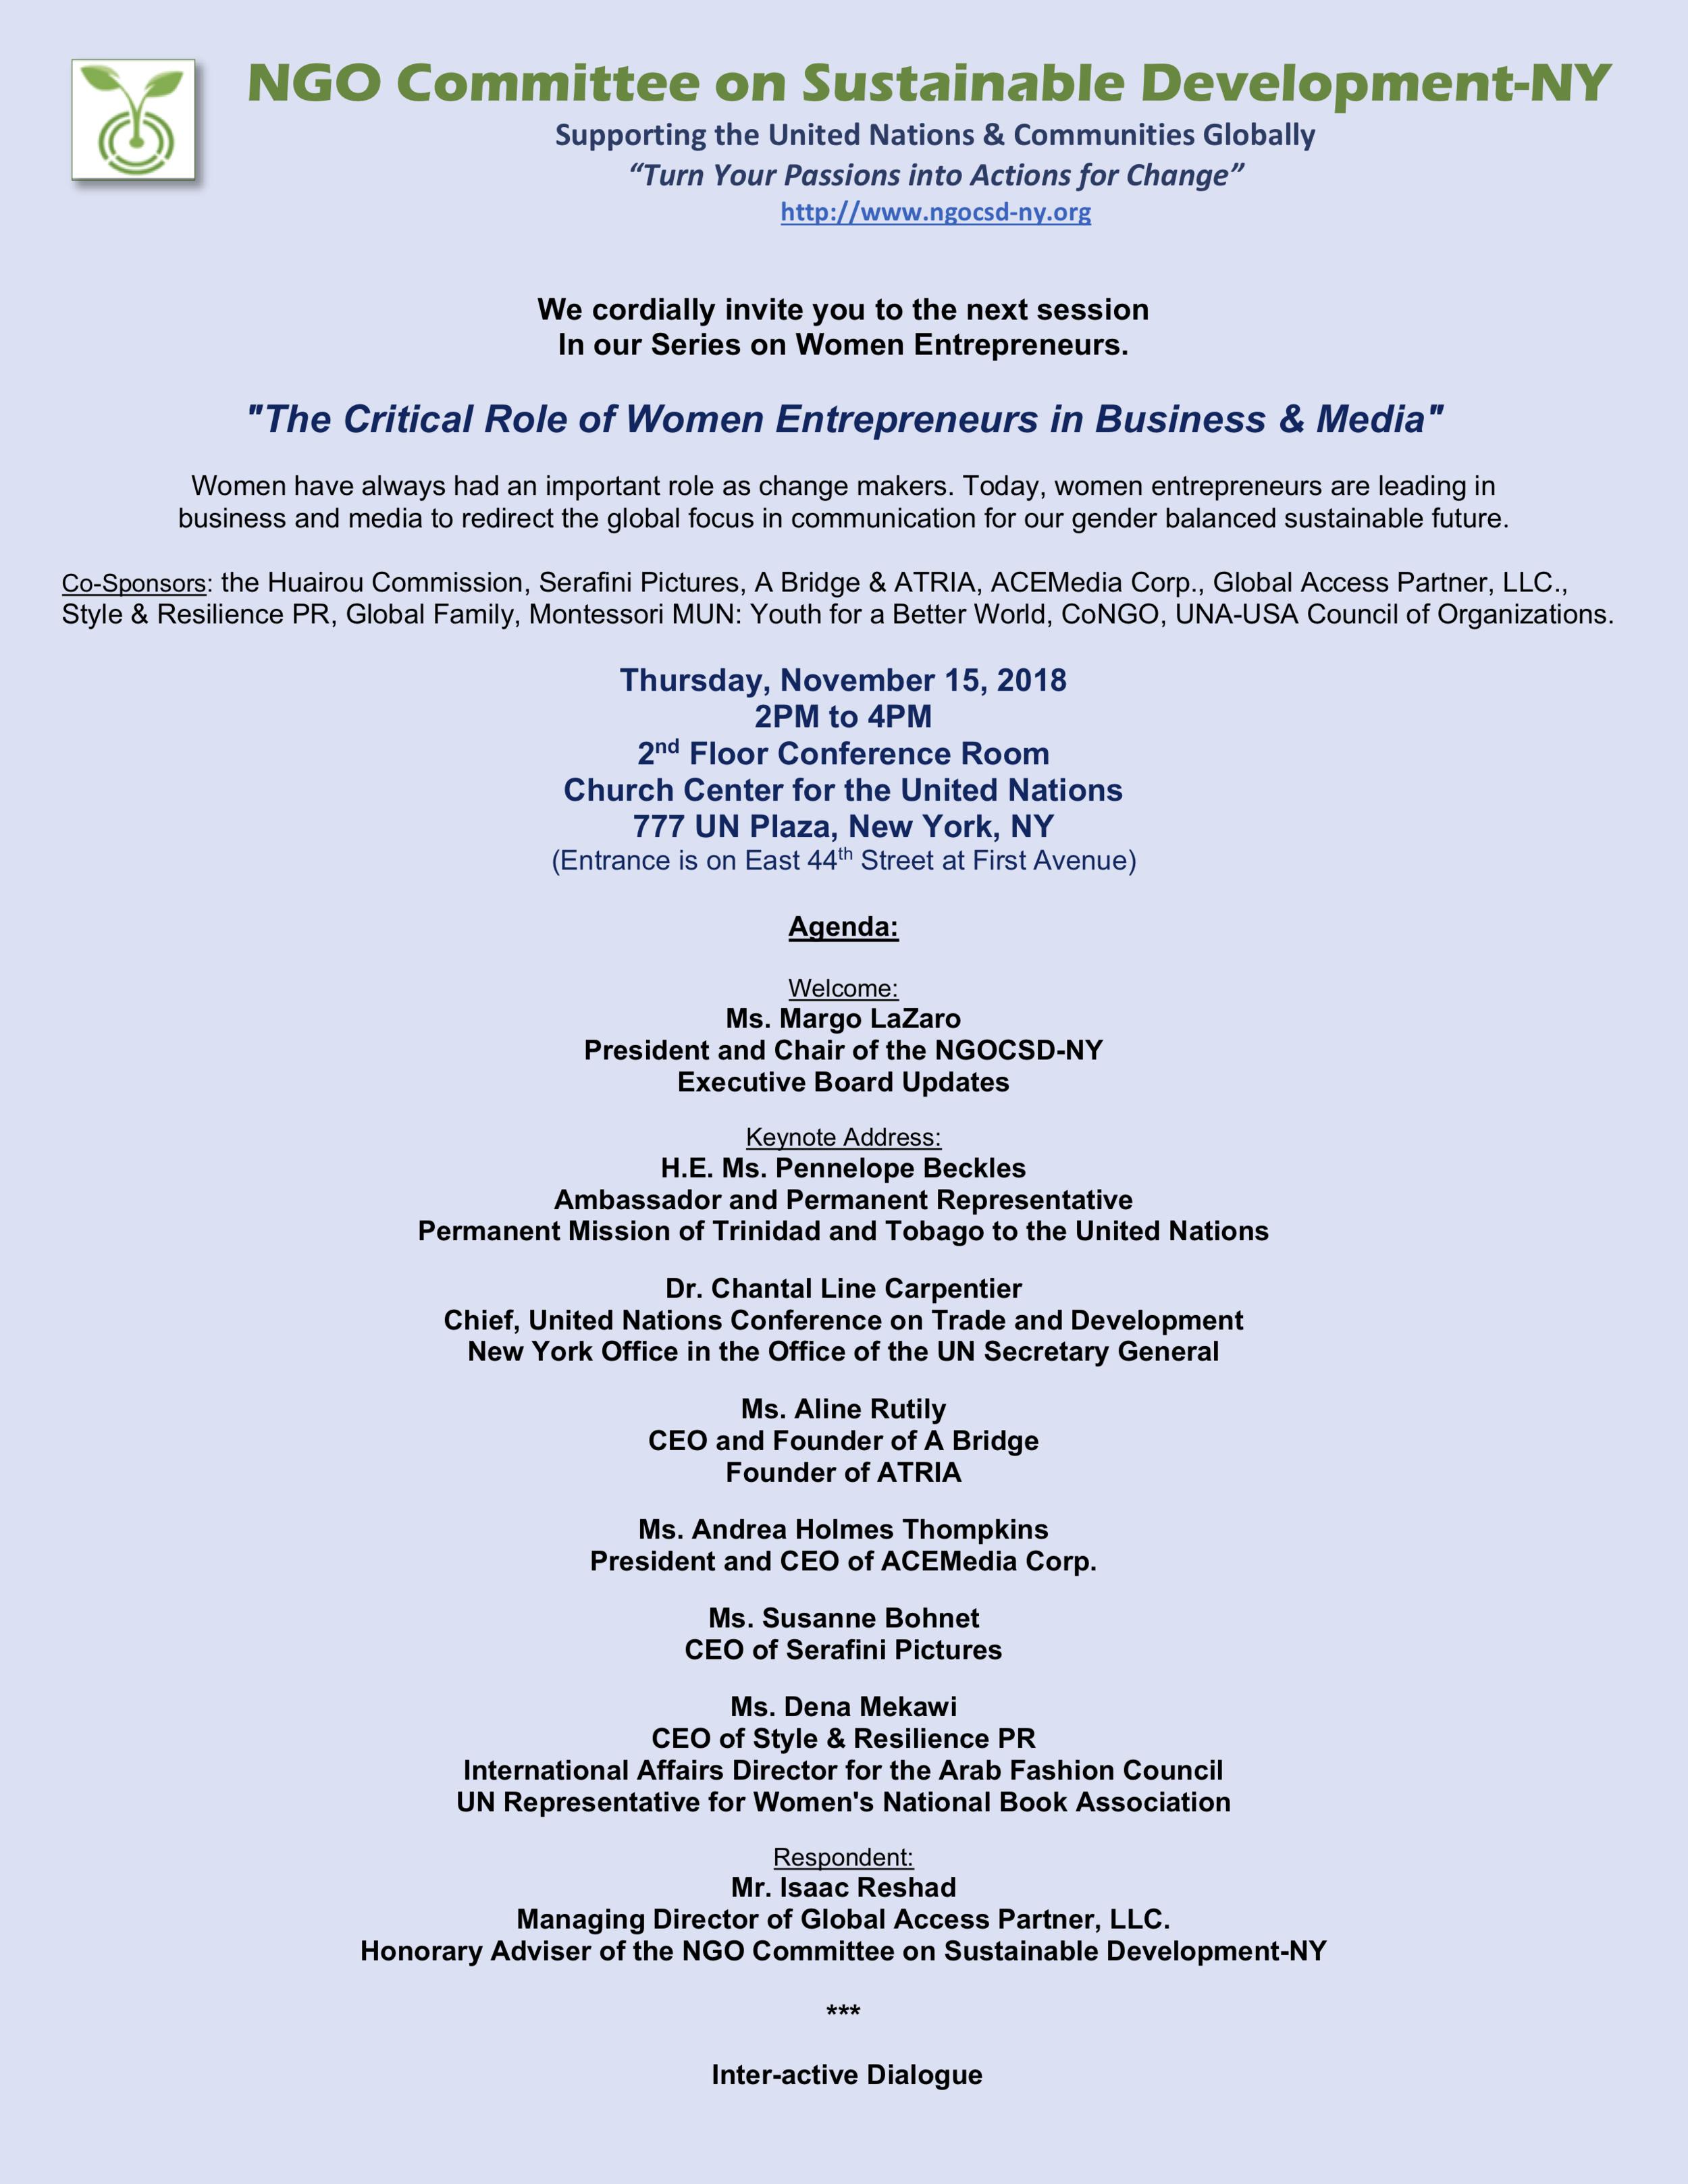 NGOCSD-NY 11-15-18 Women Entrepreneurs Series Invitation A2.png